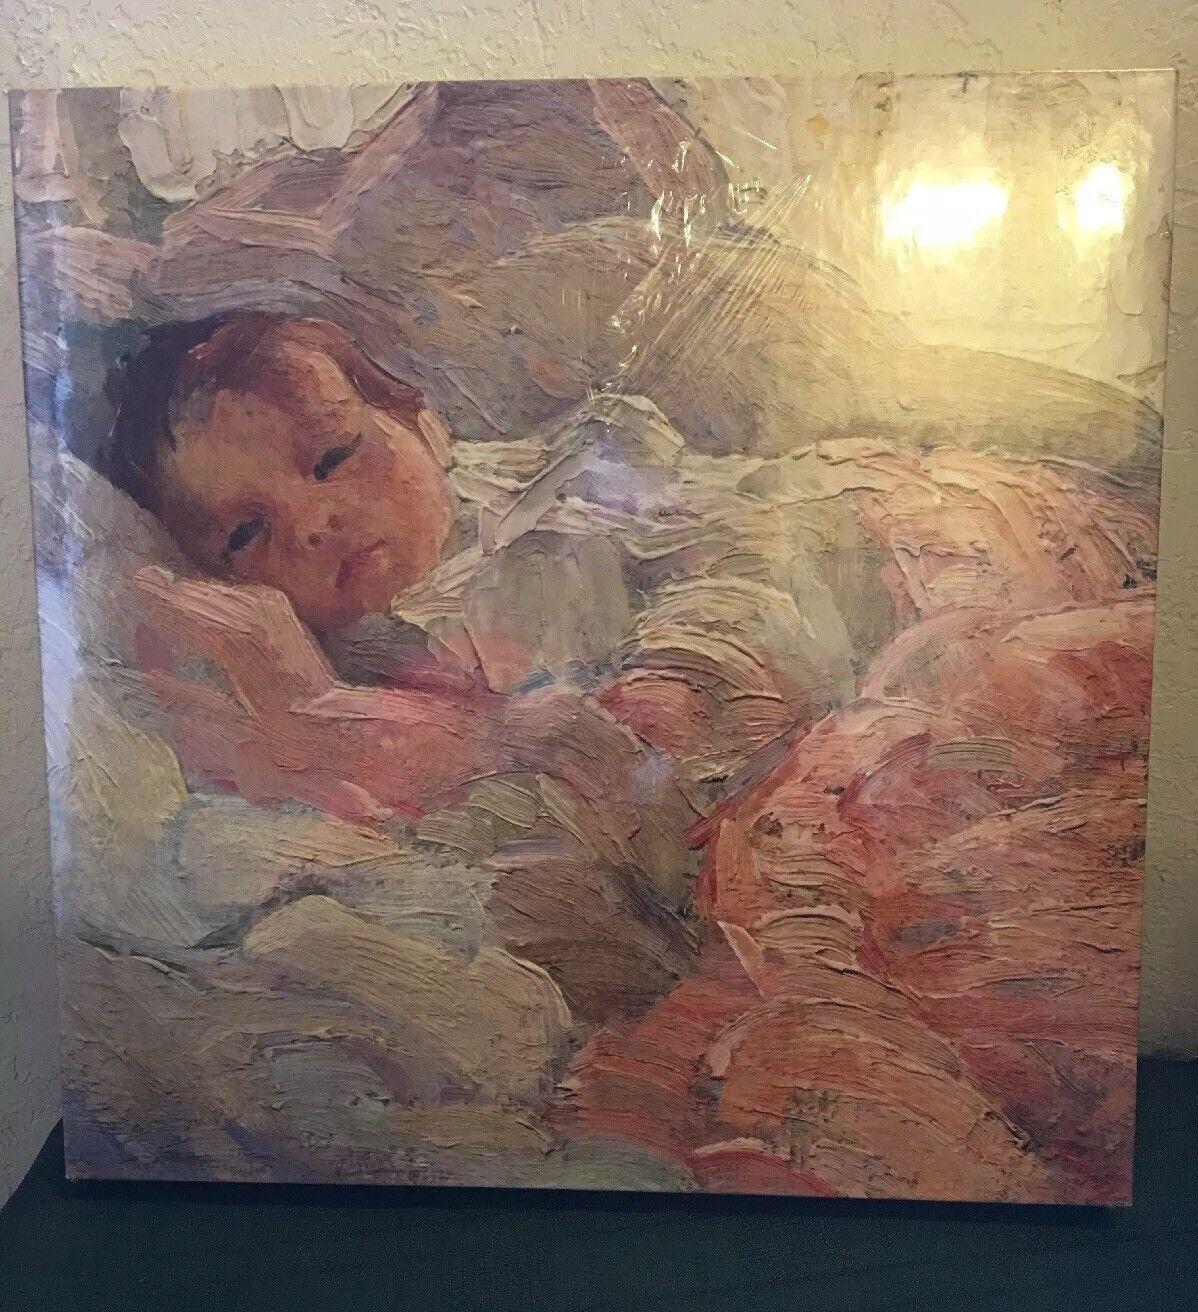 Baby - bildende kunst - tinte 500 pc - puzzle (john f. folinsbee) selten.neue